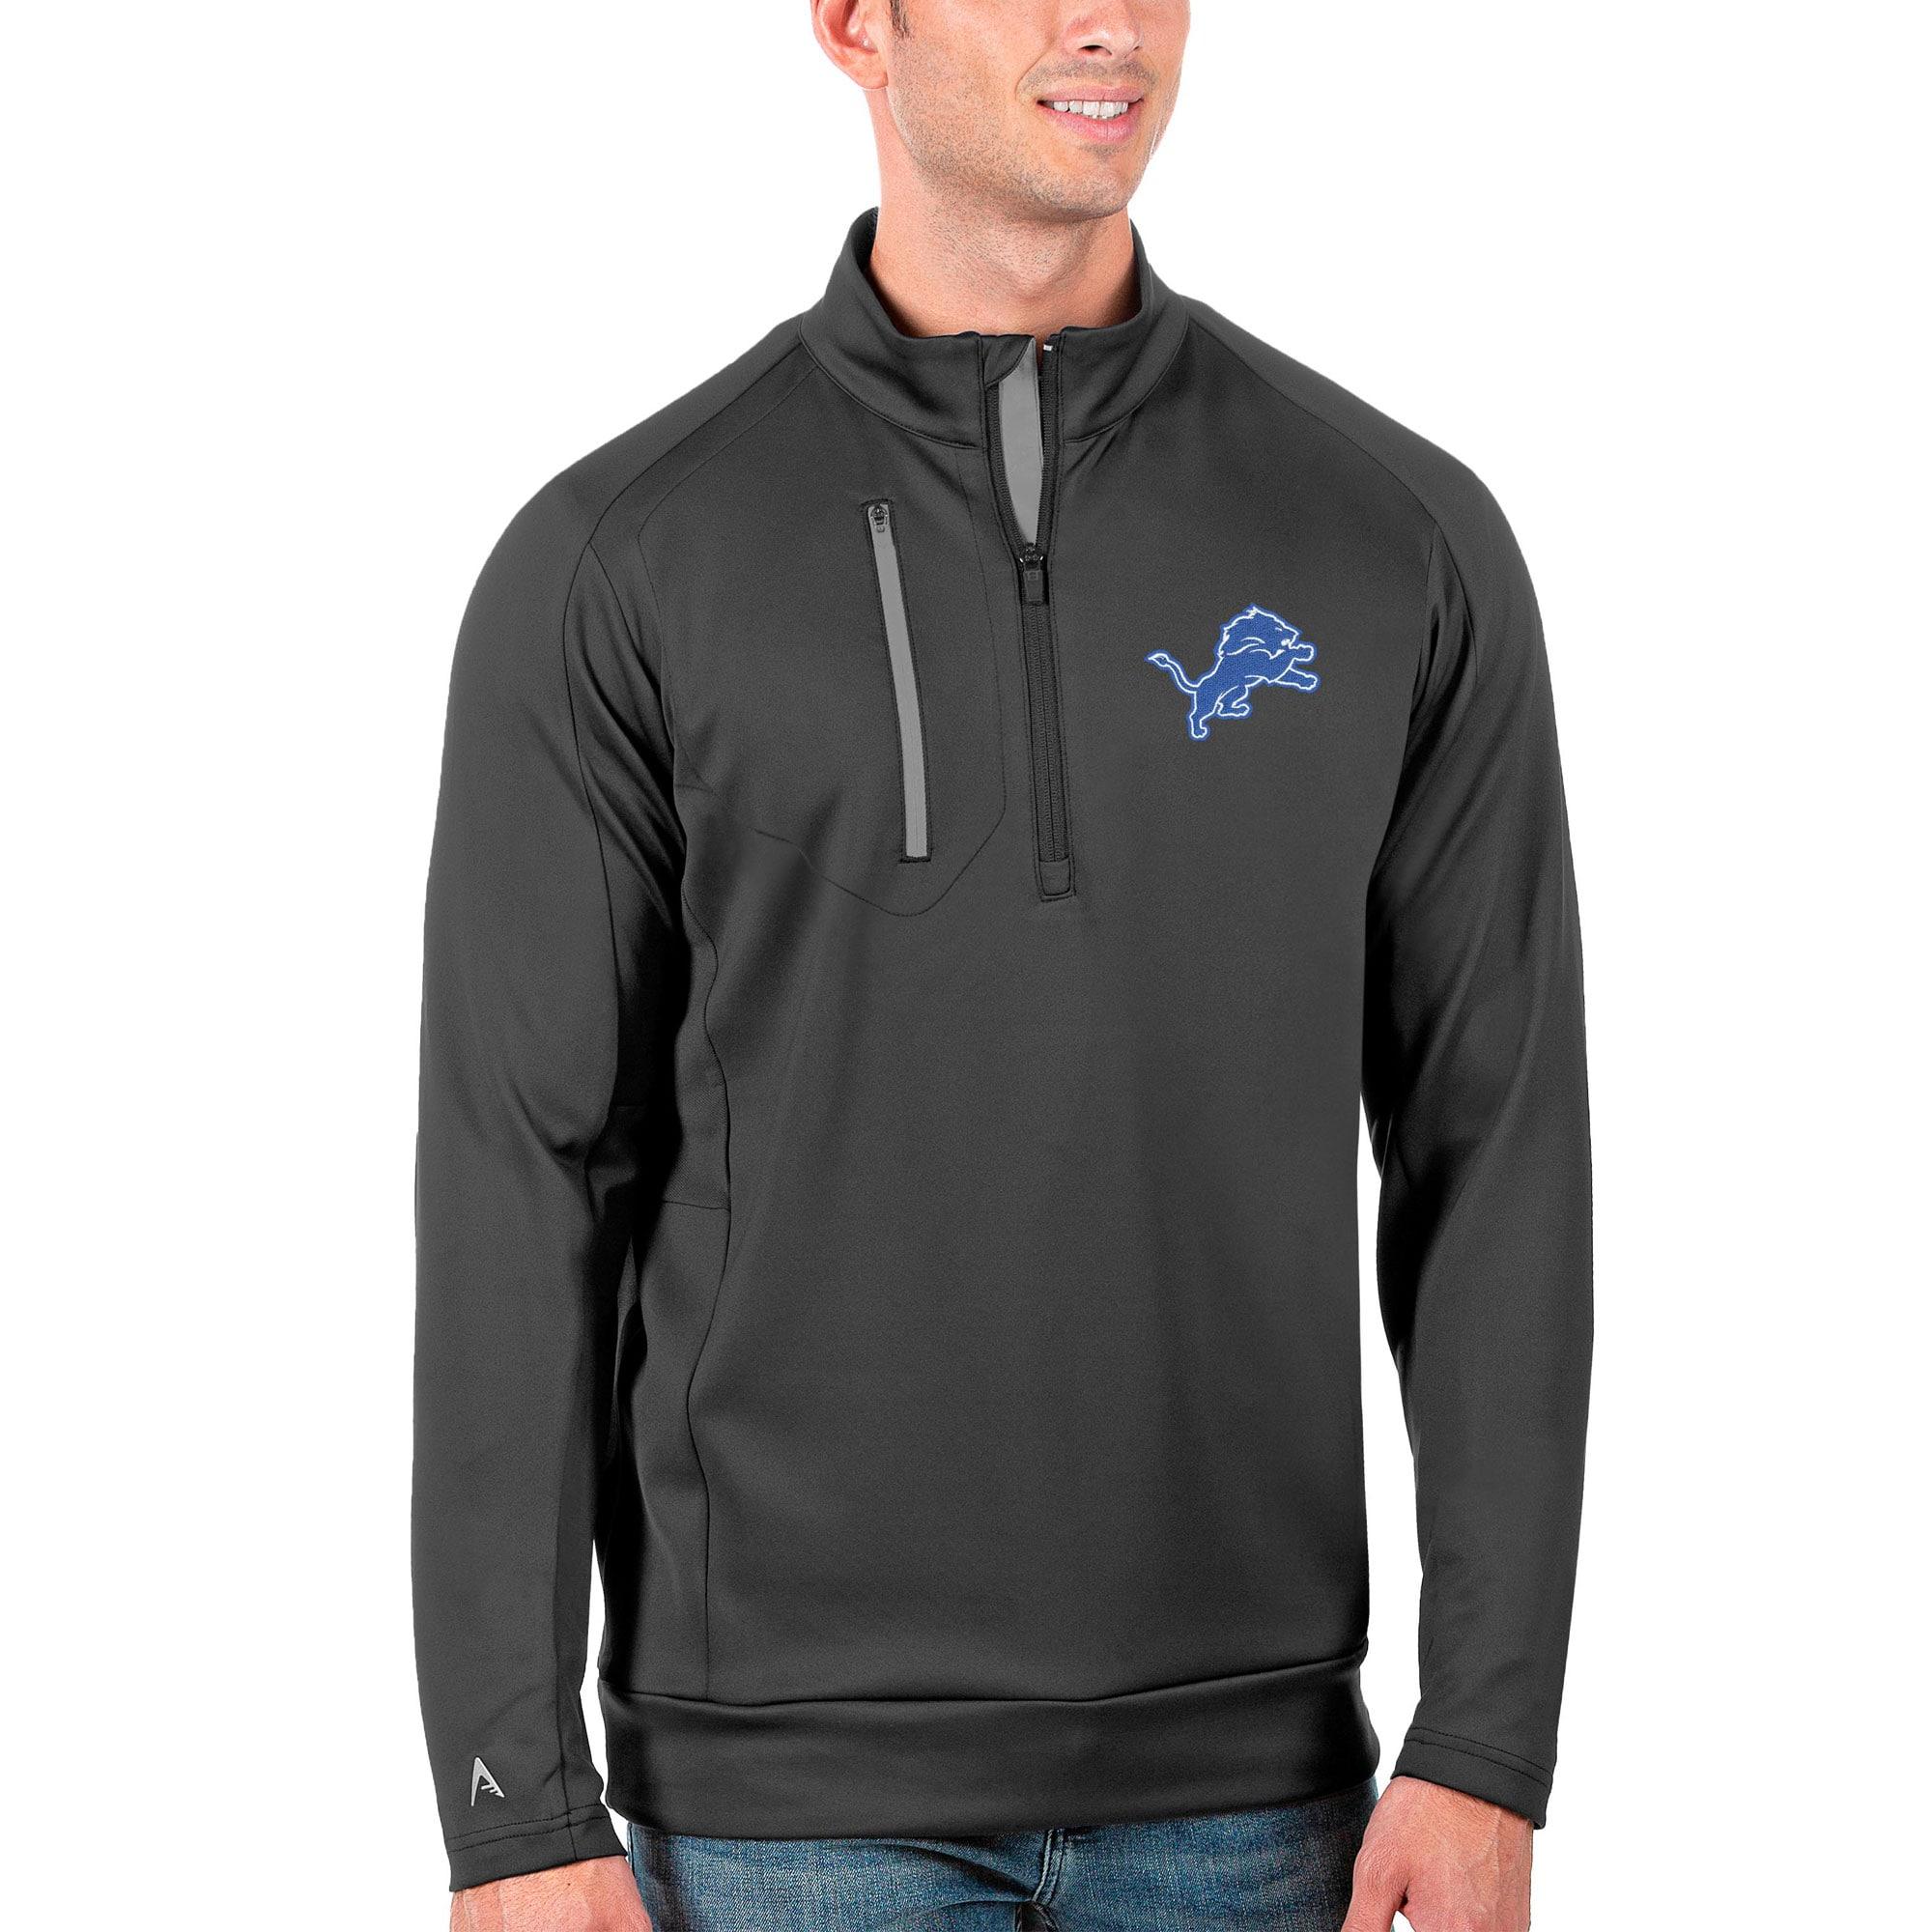 Detroit Lions Antigua Generation Quarter-Zip Pullover Jacket - Charcoal/Silver